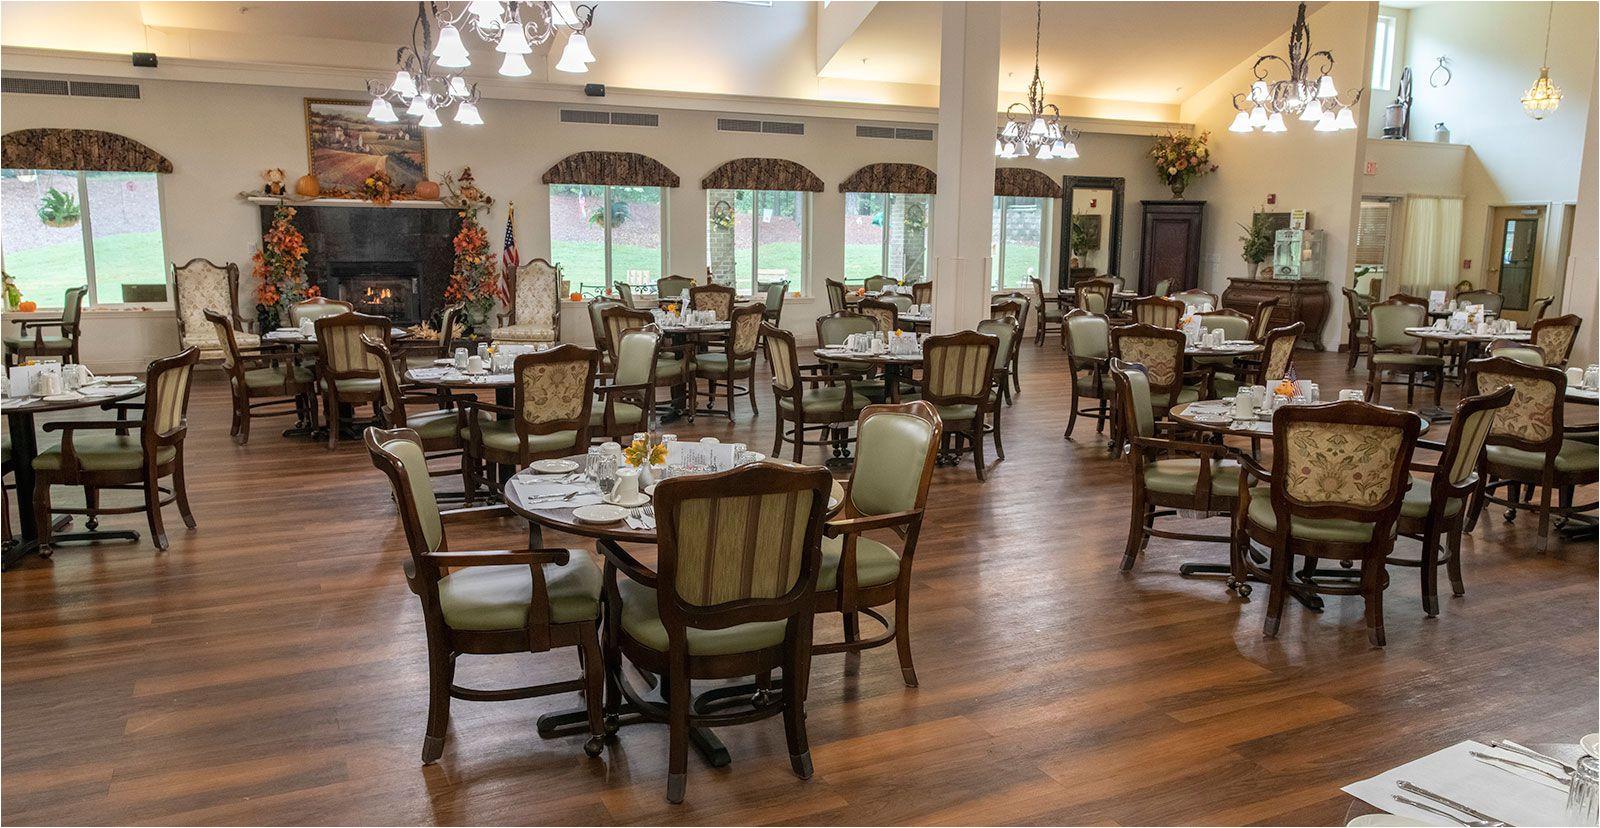 resident dining room at jordan oaks independent senior living community